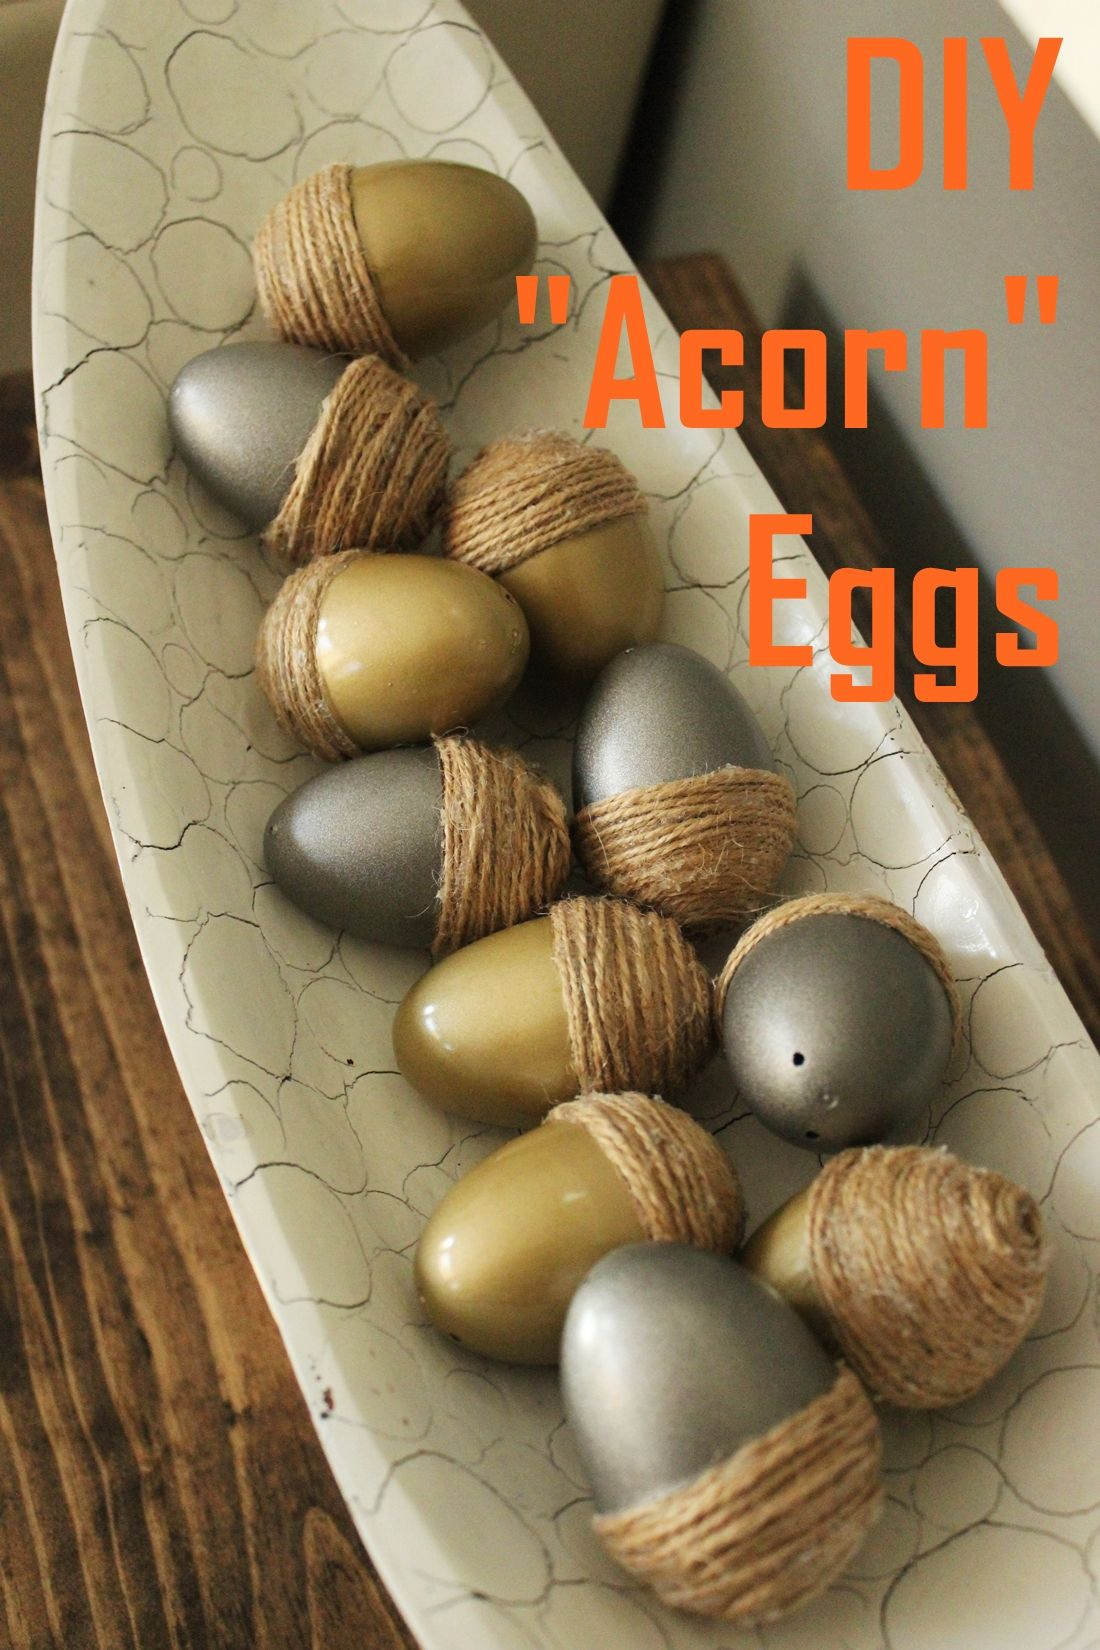 DIY Acorn Eggs